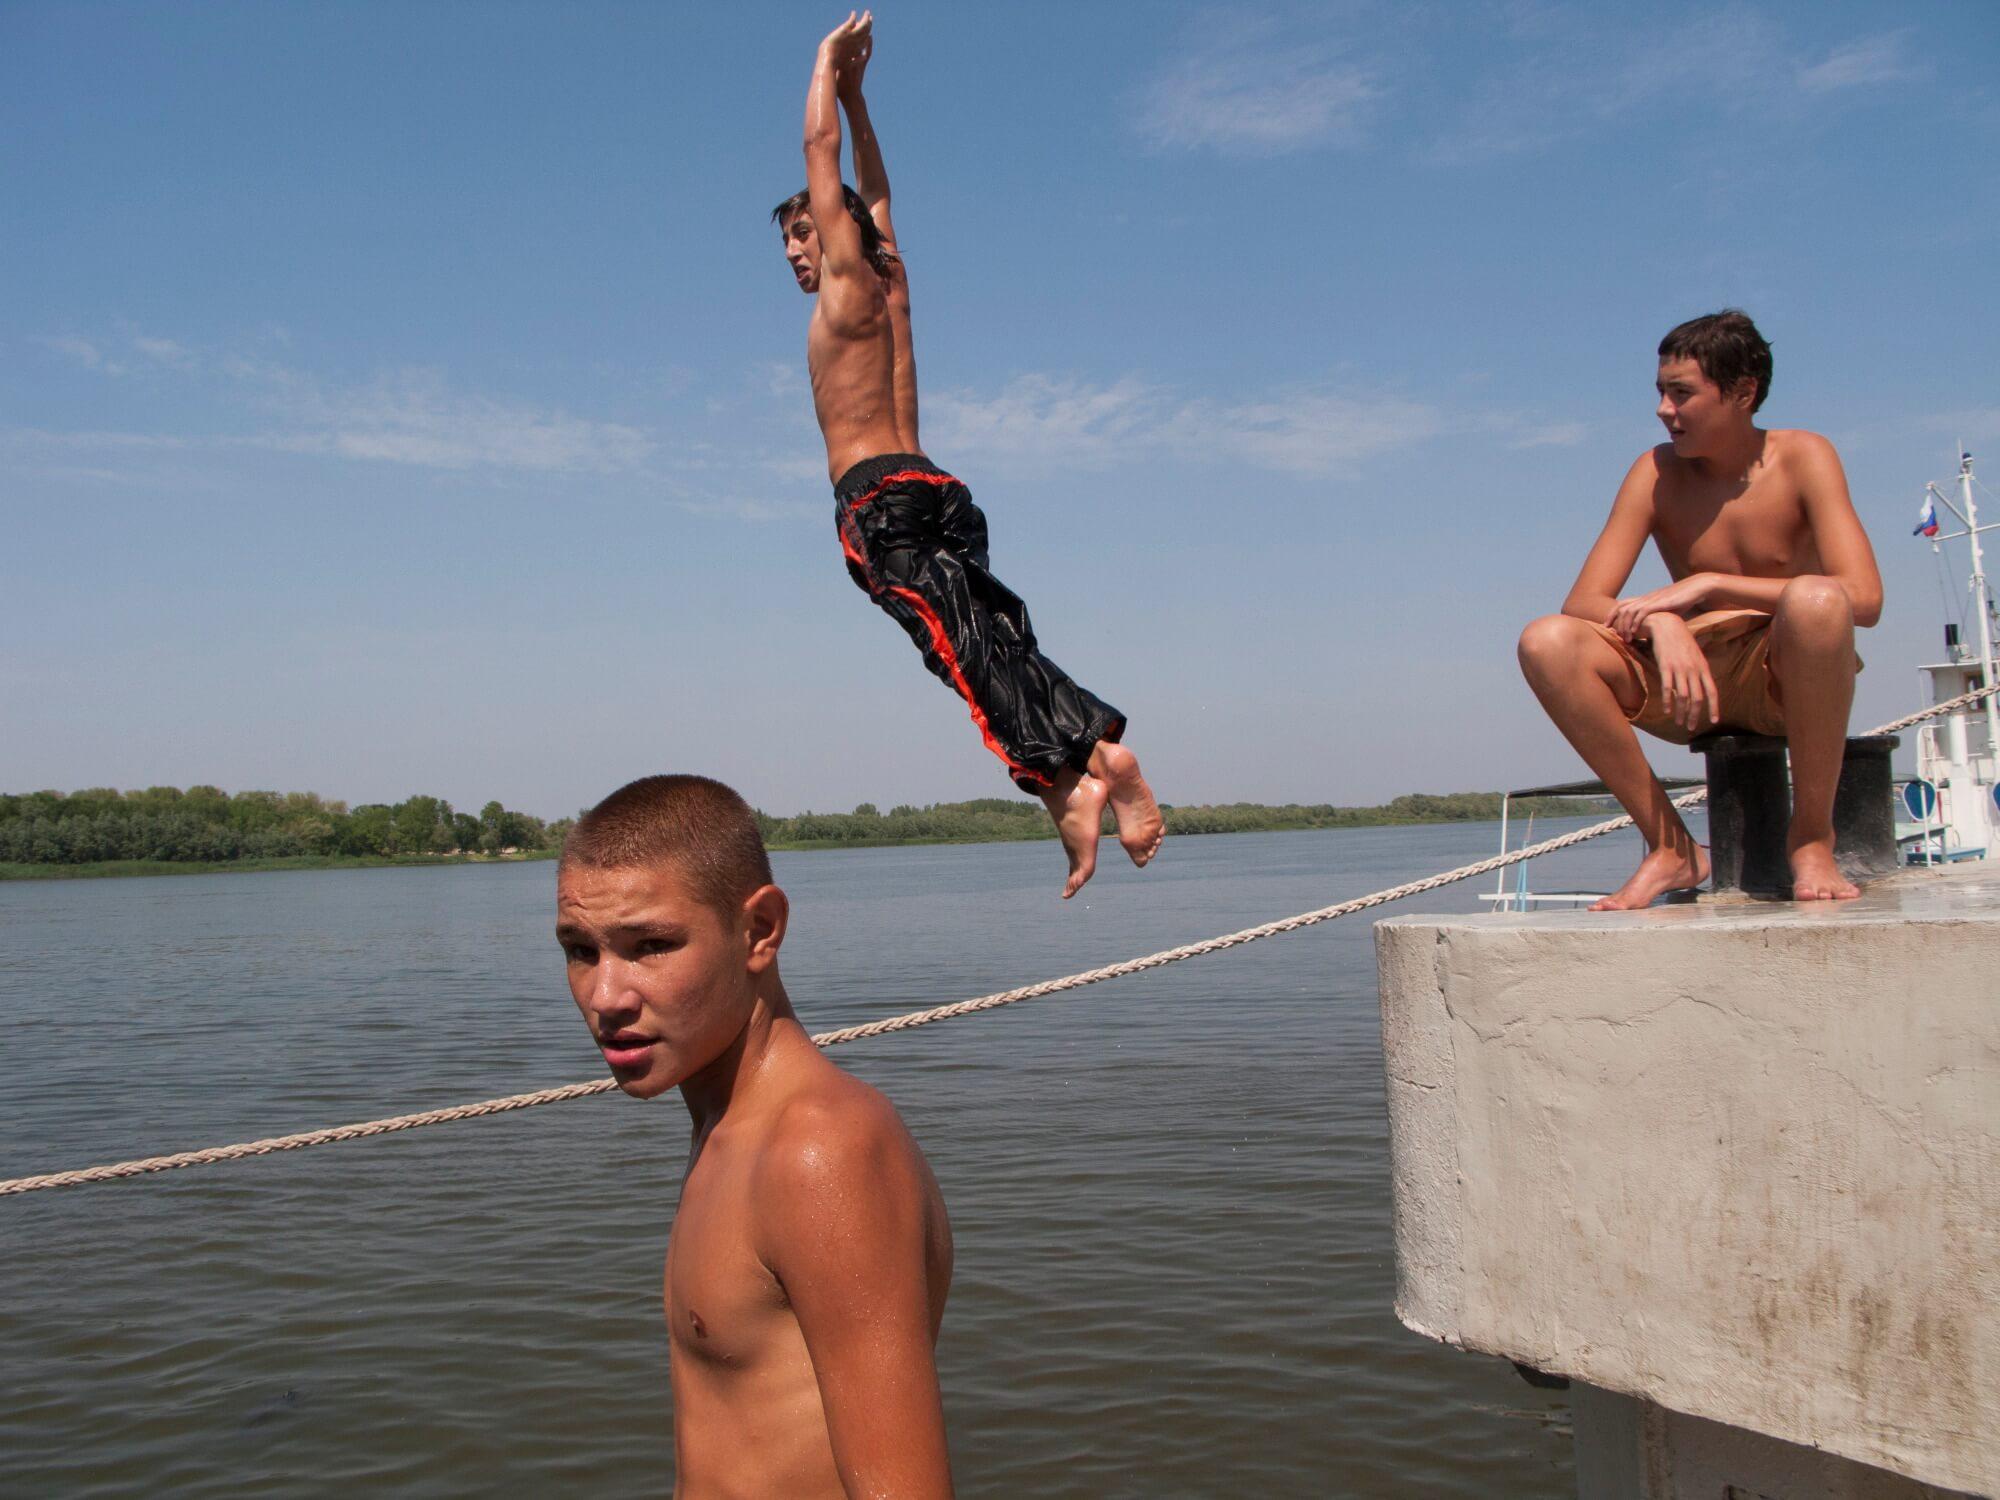 Russie, Astrakhan, 2008. - © Reza